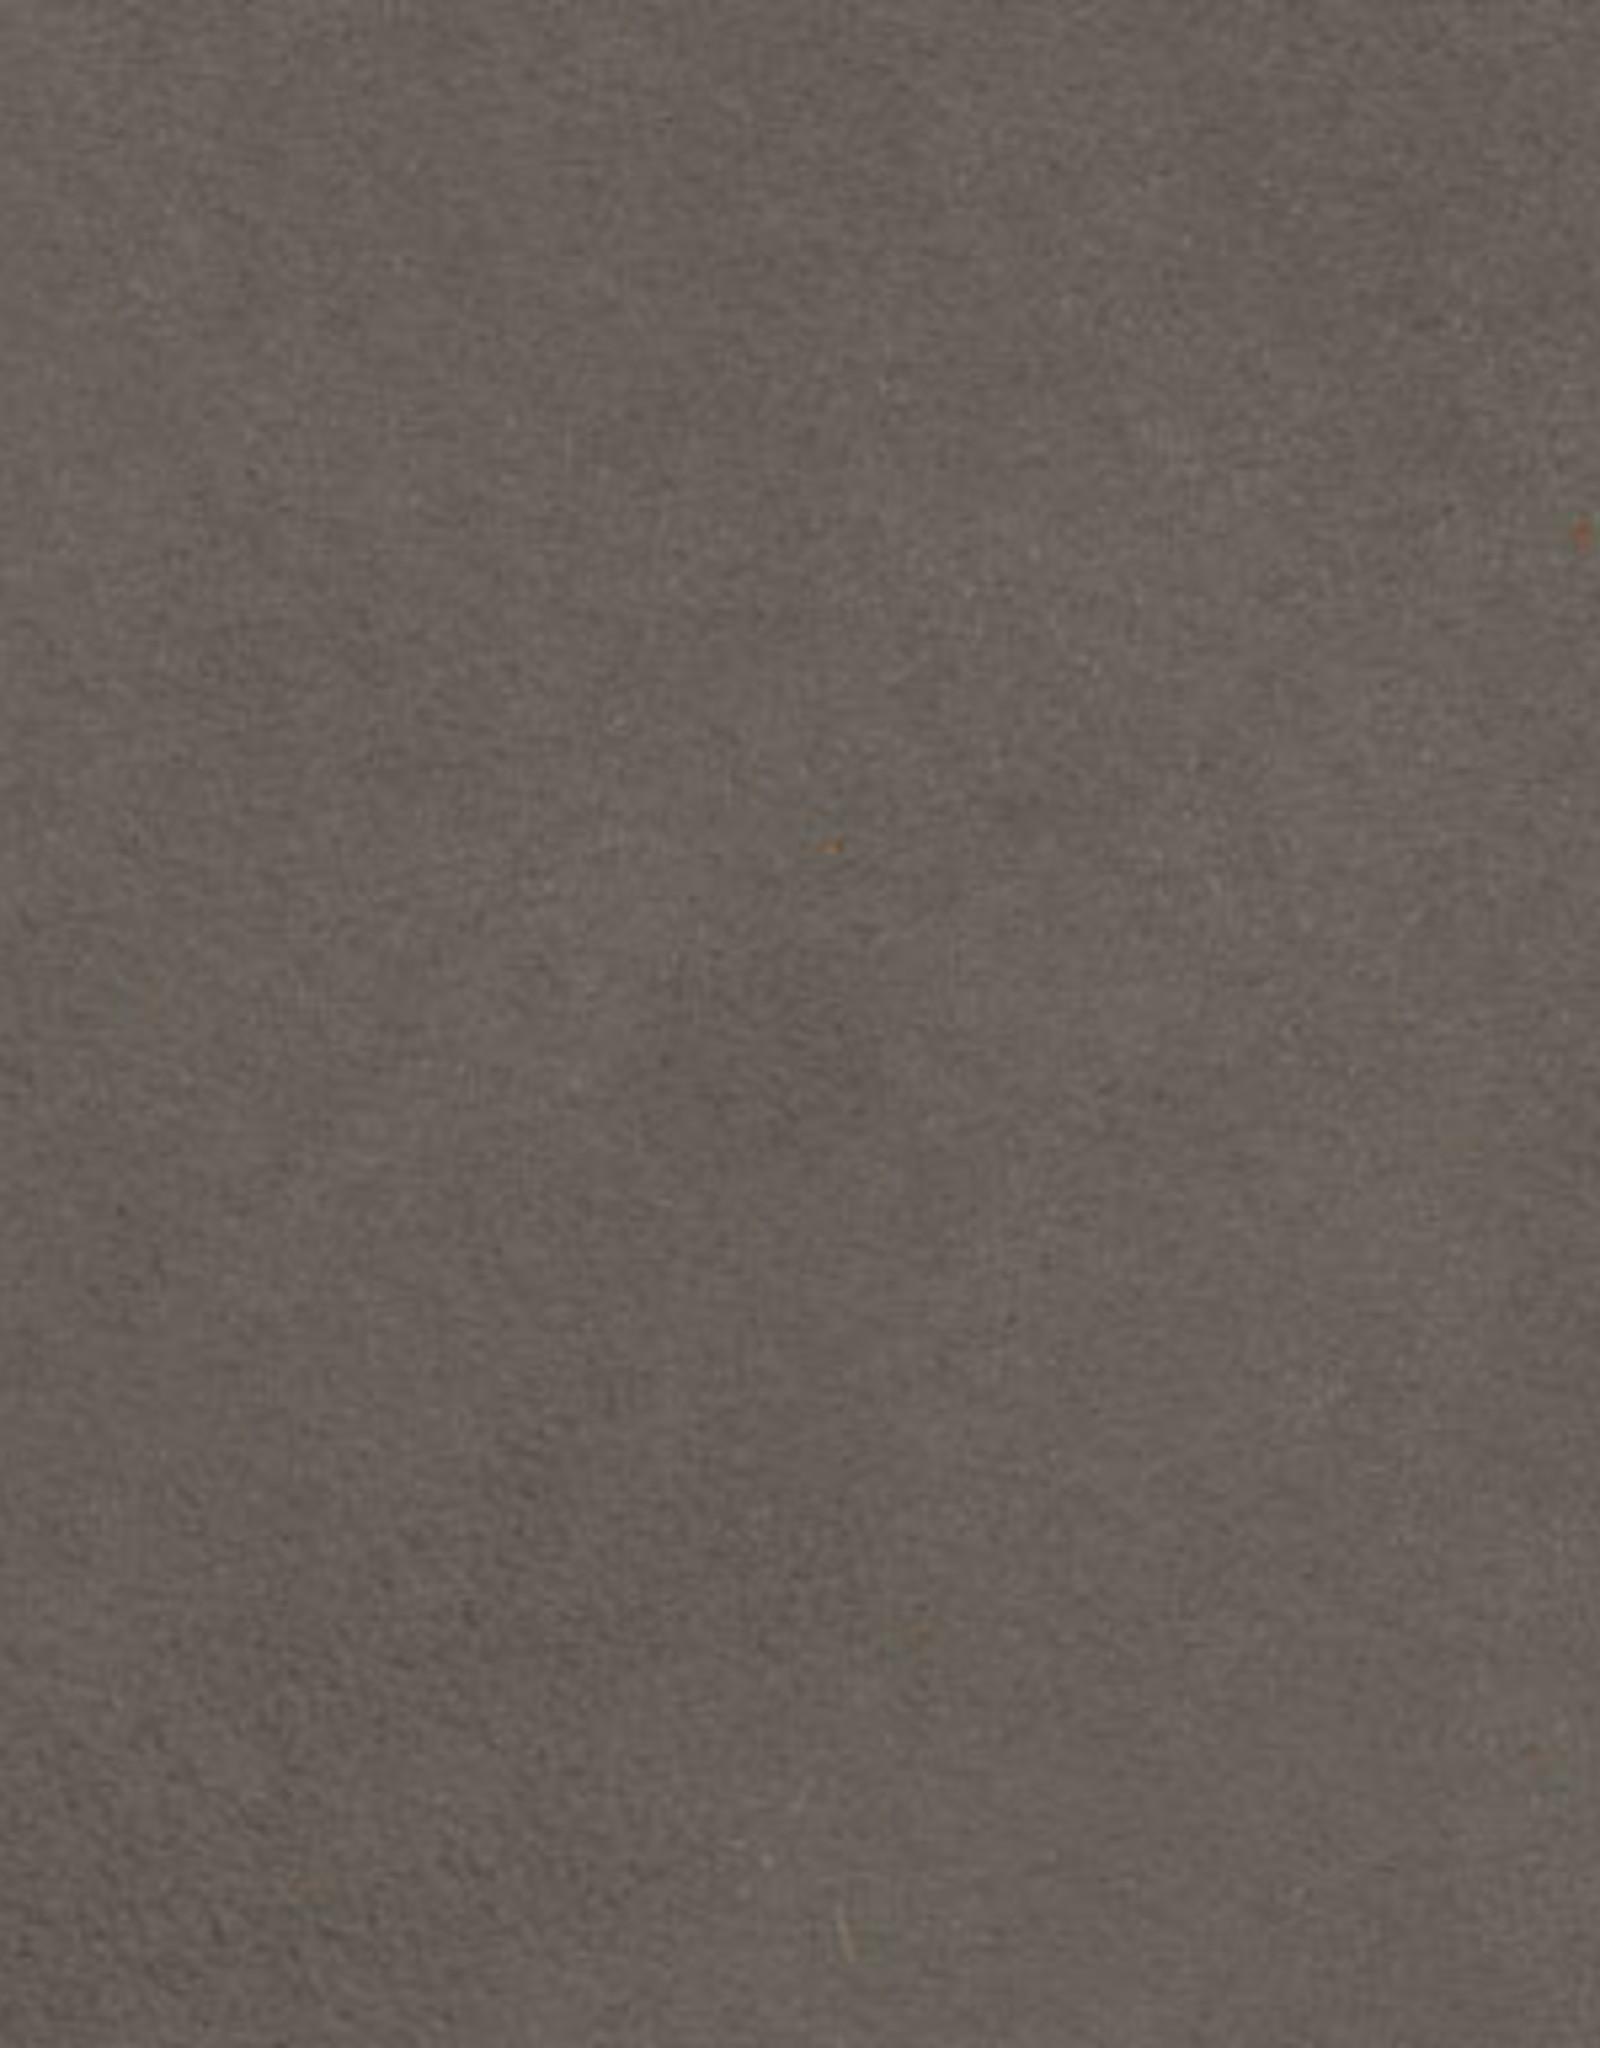 Darcy Ottoman (Cobblestone) - Online Only